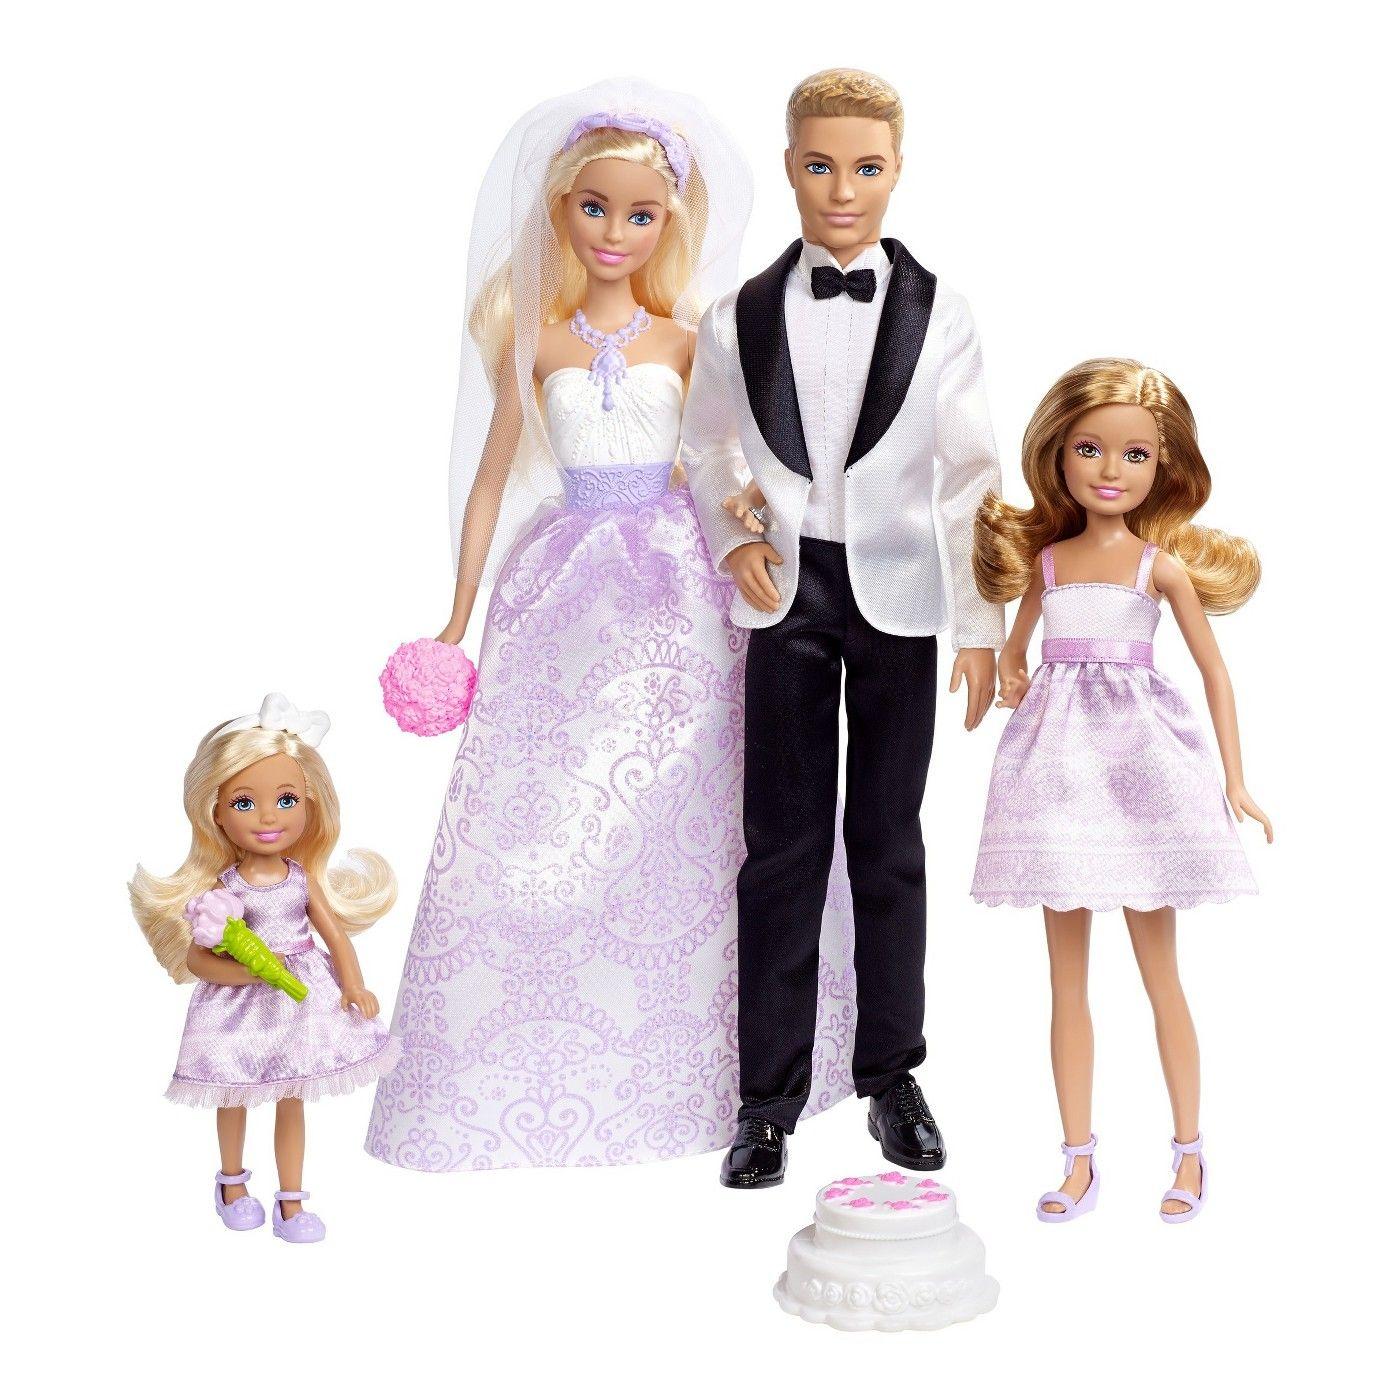 Barbie Wedding Gift Set image 1 of 7 Barbie bride